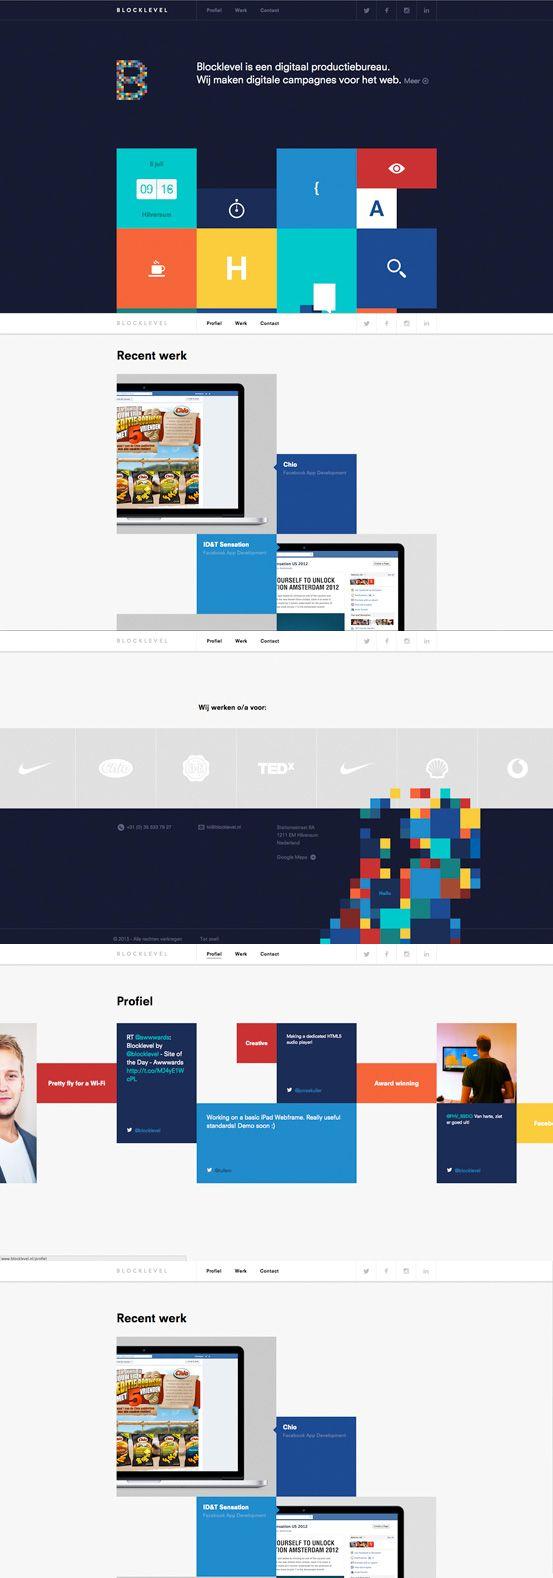 HTML designs